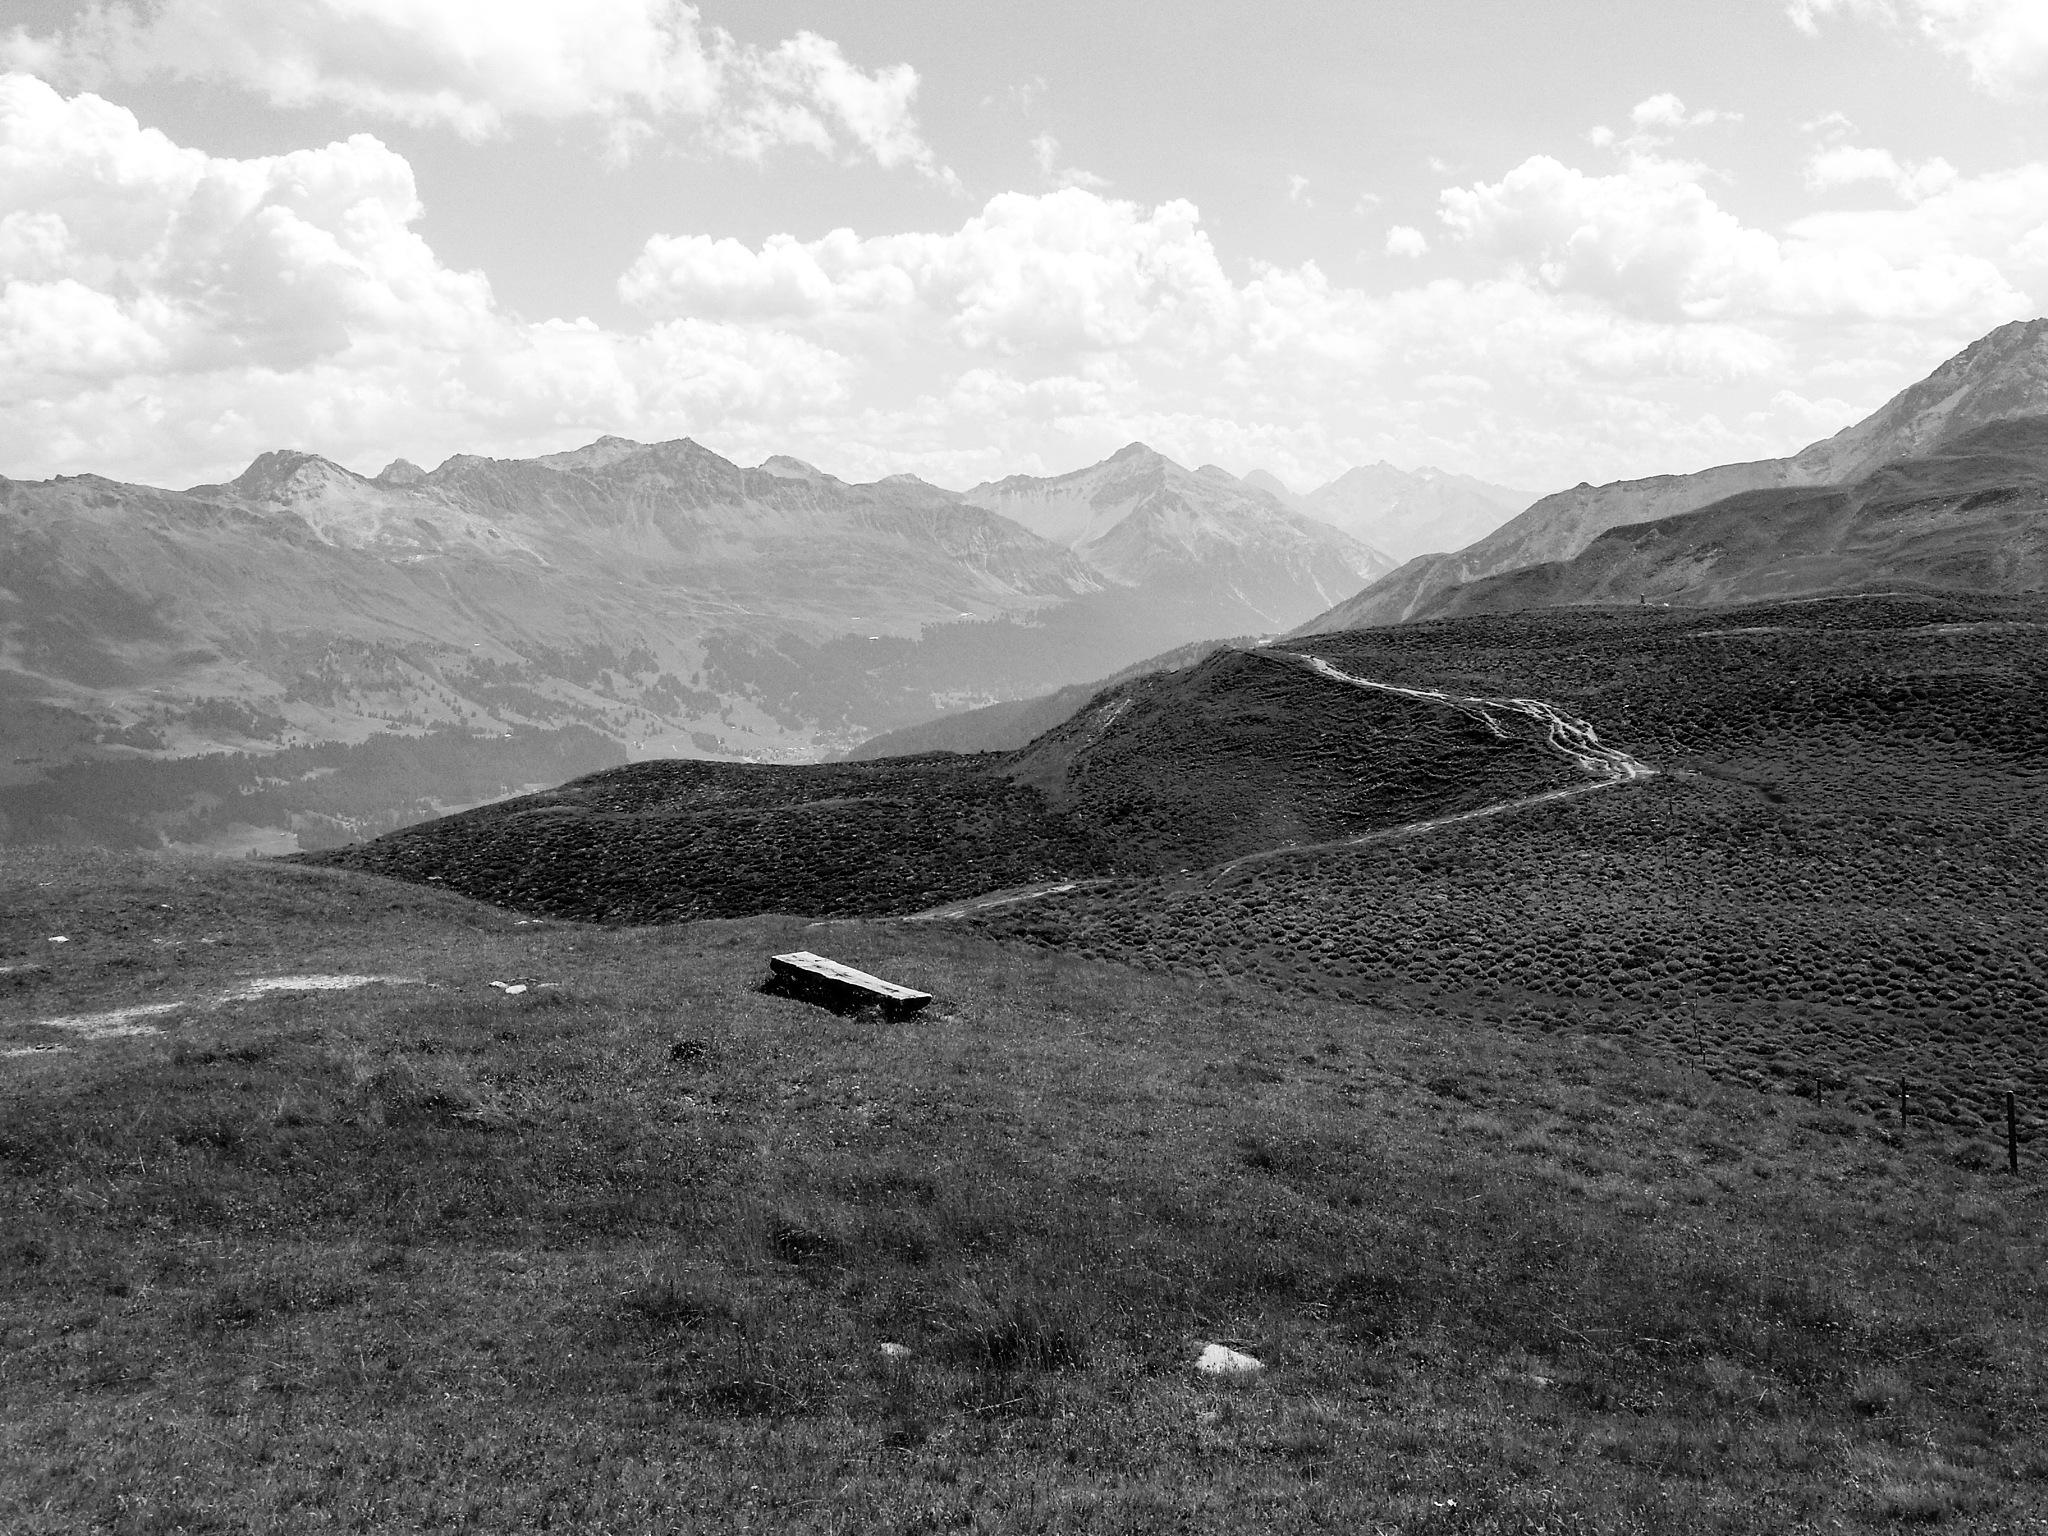 Over the Mountains by raffaelstaeubli